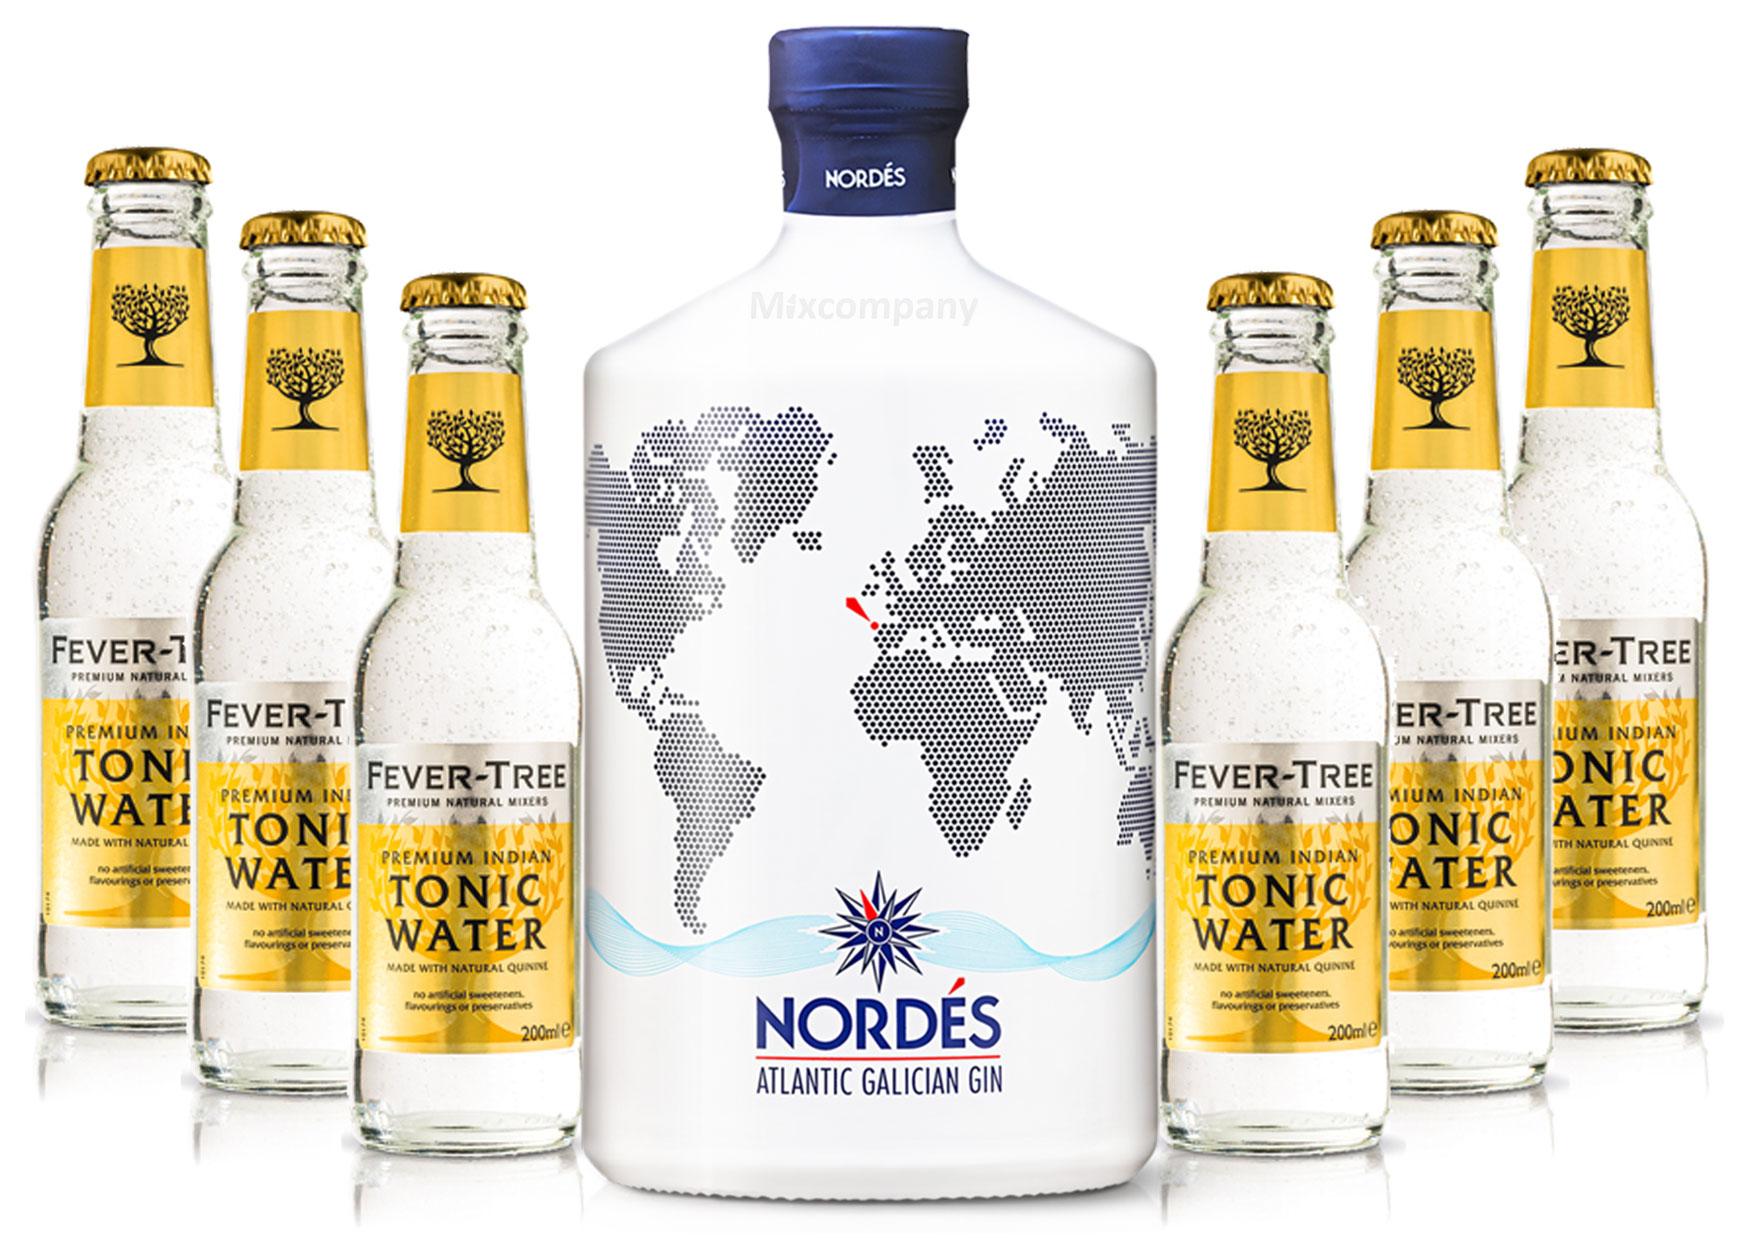 Nordes Atlantic Galician Gin aus Galizien 0,7l (40% Vol) + 6x Fever-Tree Premium Indian Tonic Water 0,2l MEHRWEG inkl. Pfand- [Enthält Sulfite]